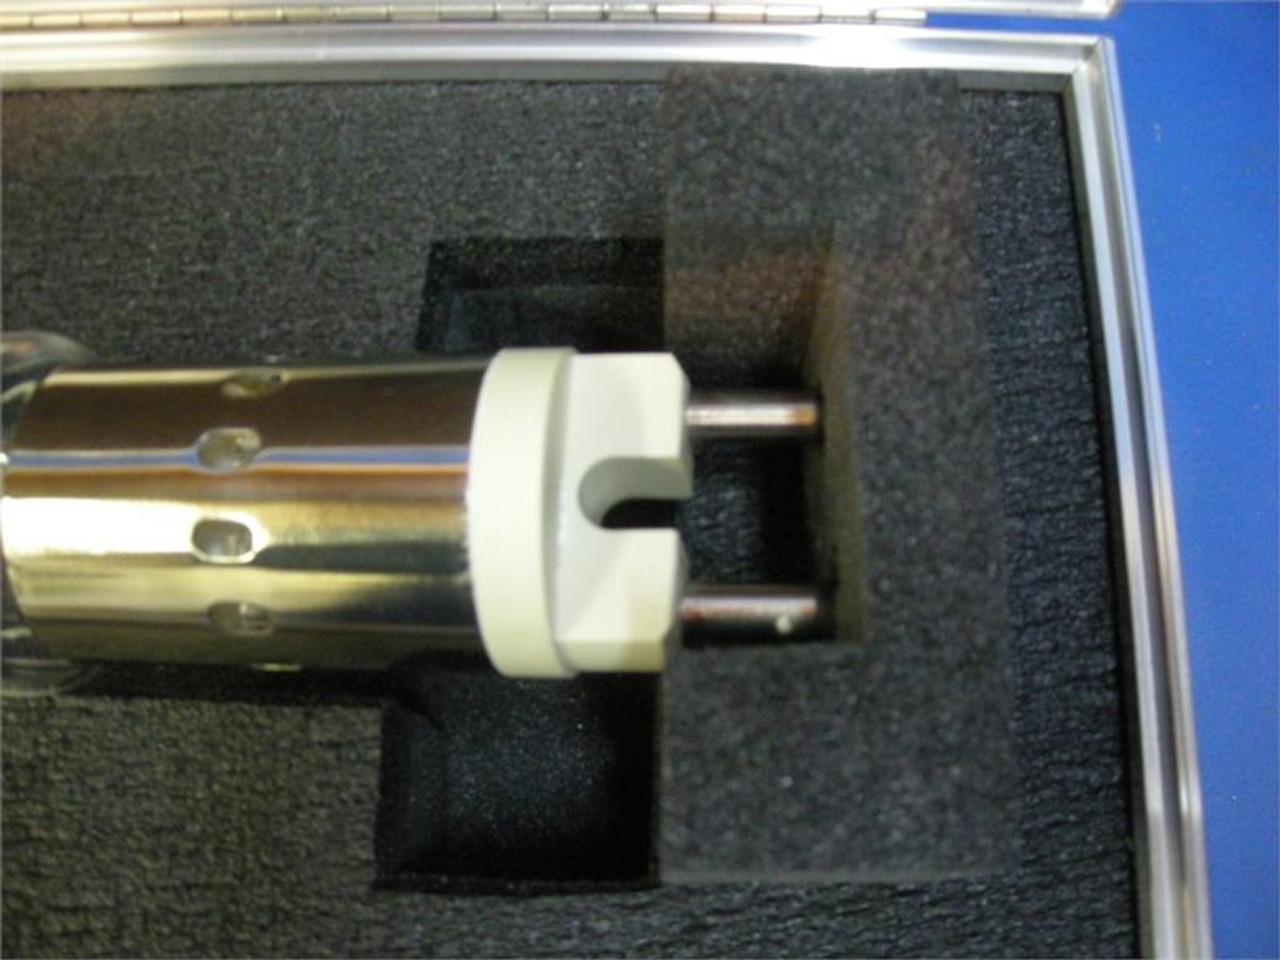 6K Light Bulb Custom ATA Shipping Case - Interior View Loaded Close Up